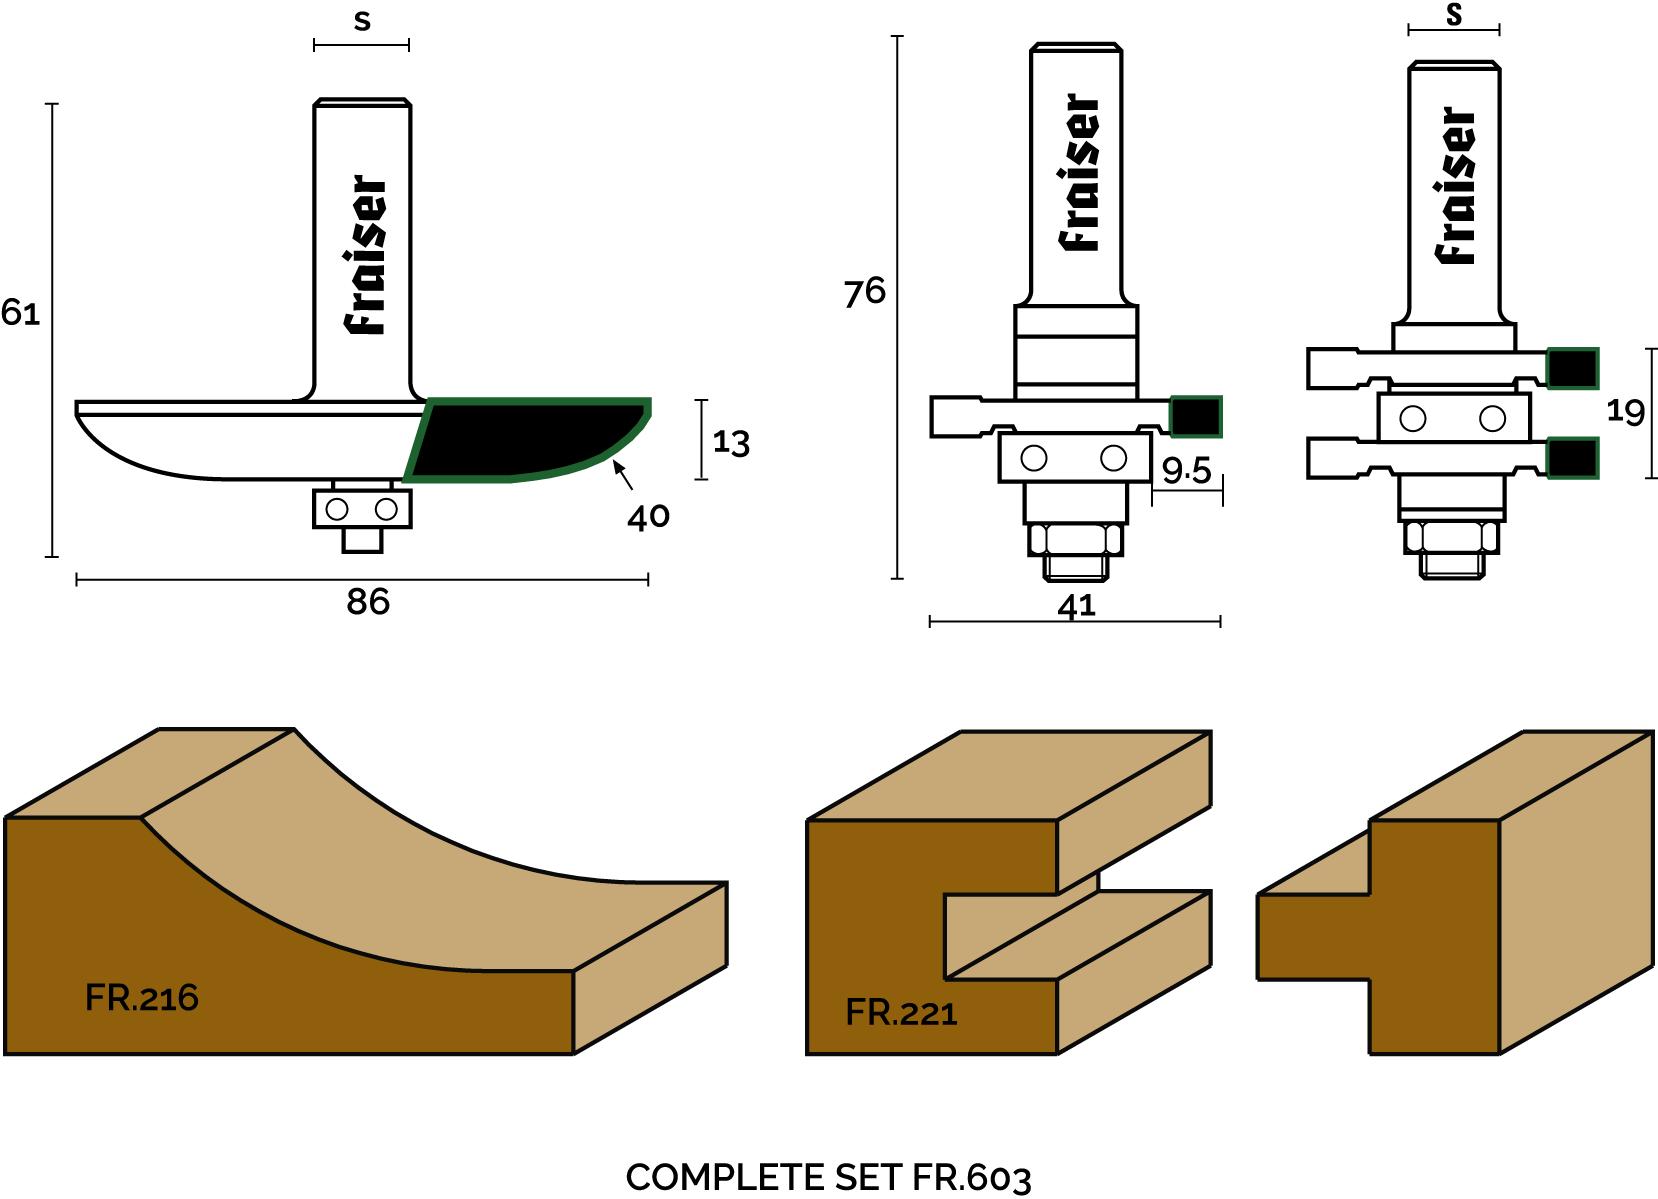 FR.603